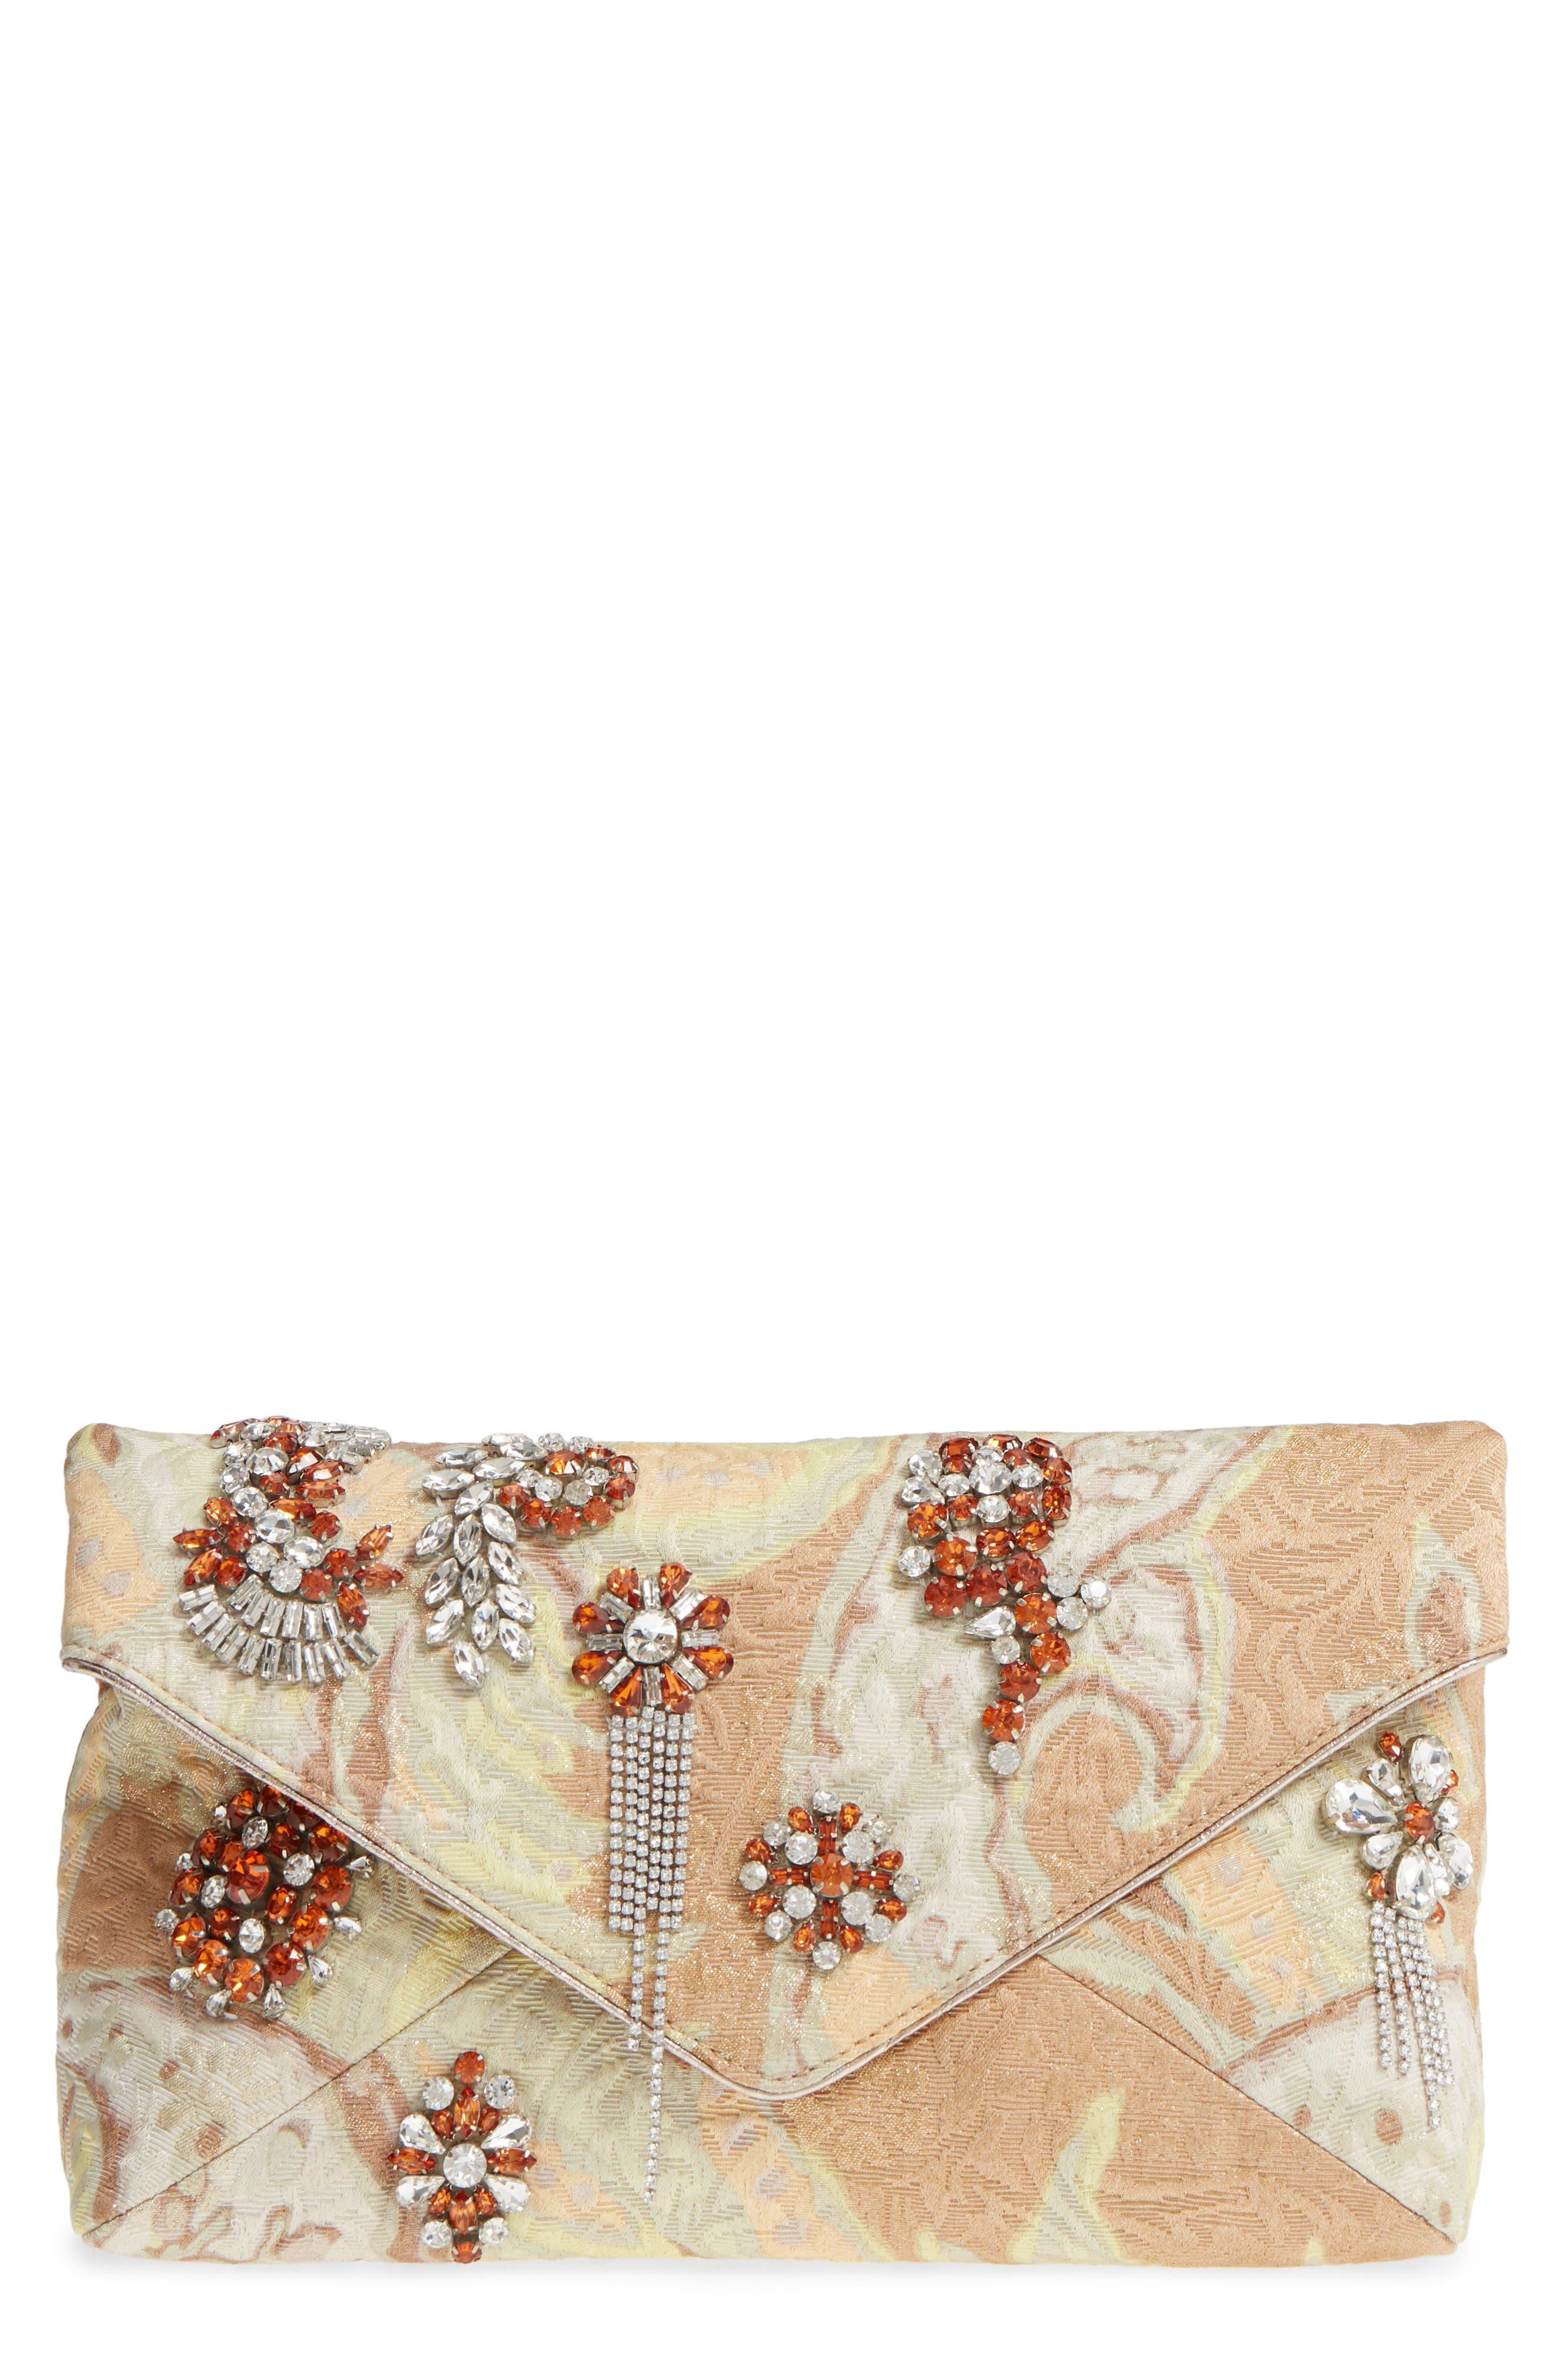 Crystal Embellished Brocade Envelope Clutch,                             Main thumbnail 1, color,                             NATURAL